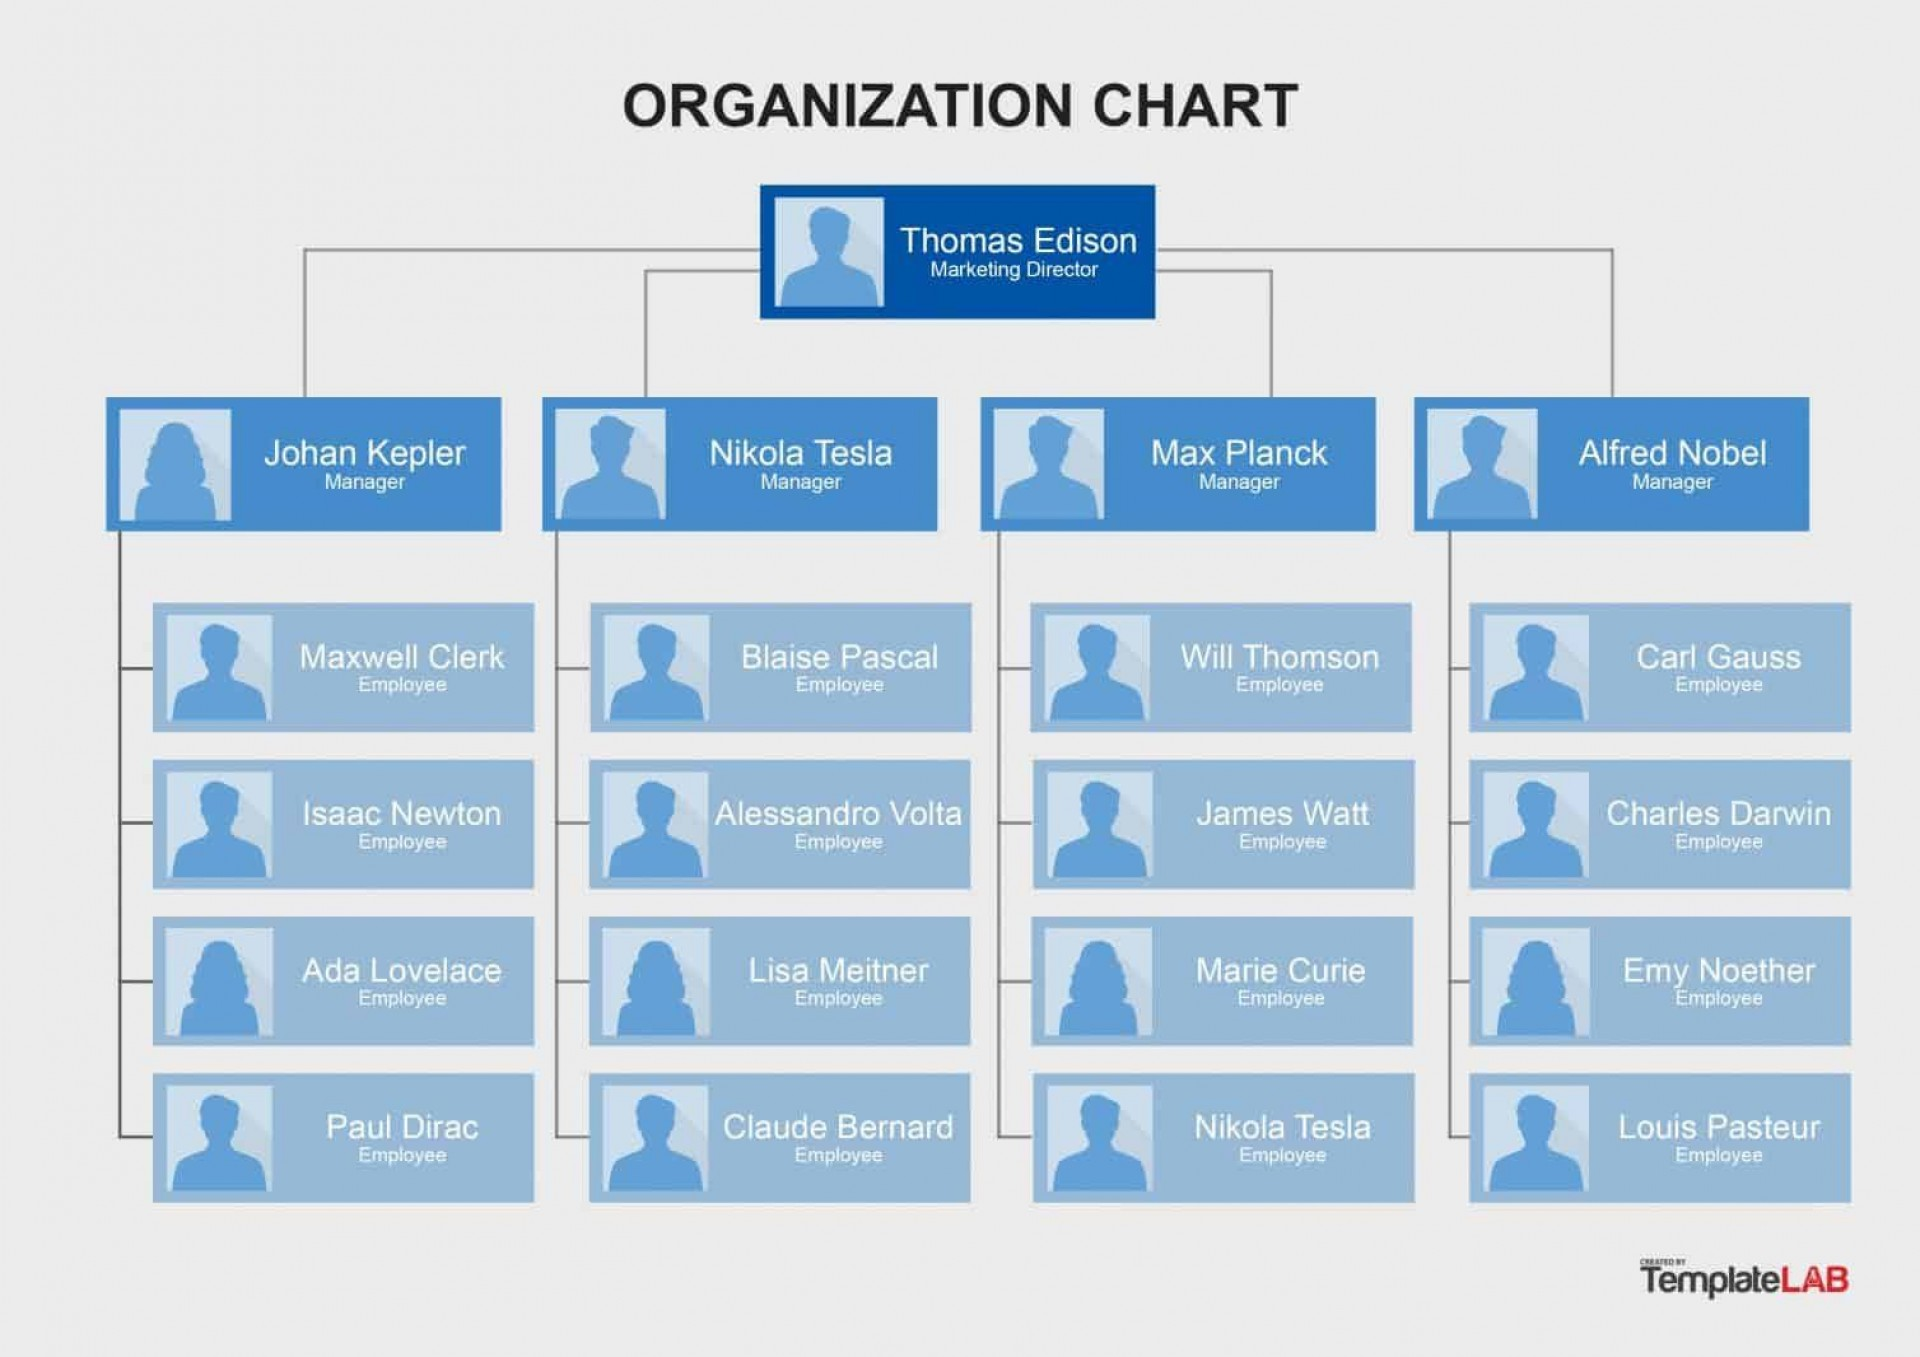 008 Unforgettable Microsoft Organizational Chart Template High Definition  Templates Visio Org M Office Organization Powerpoint1920